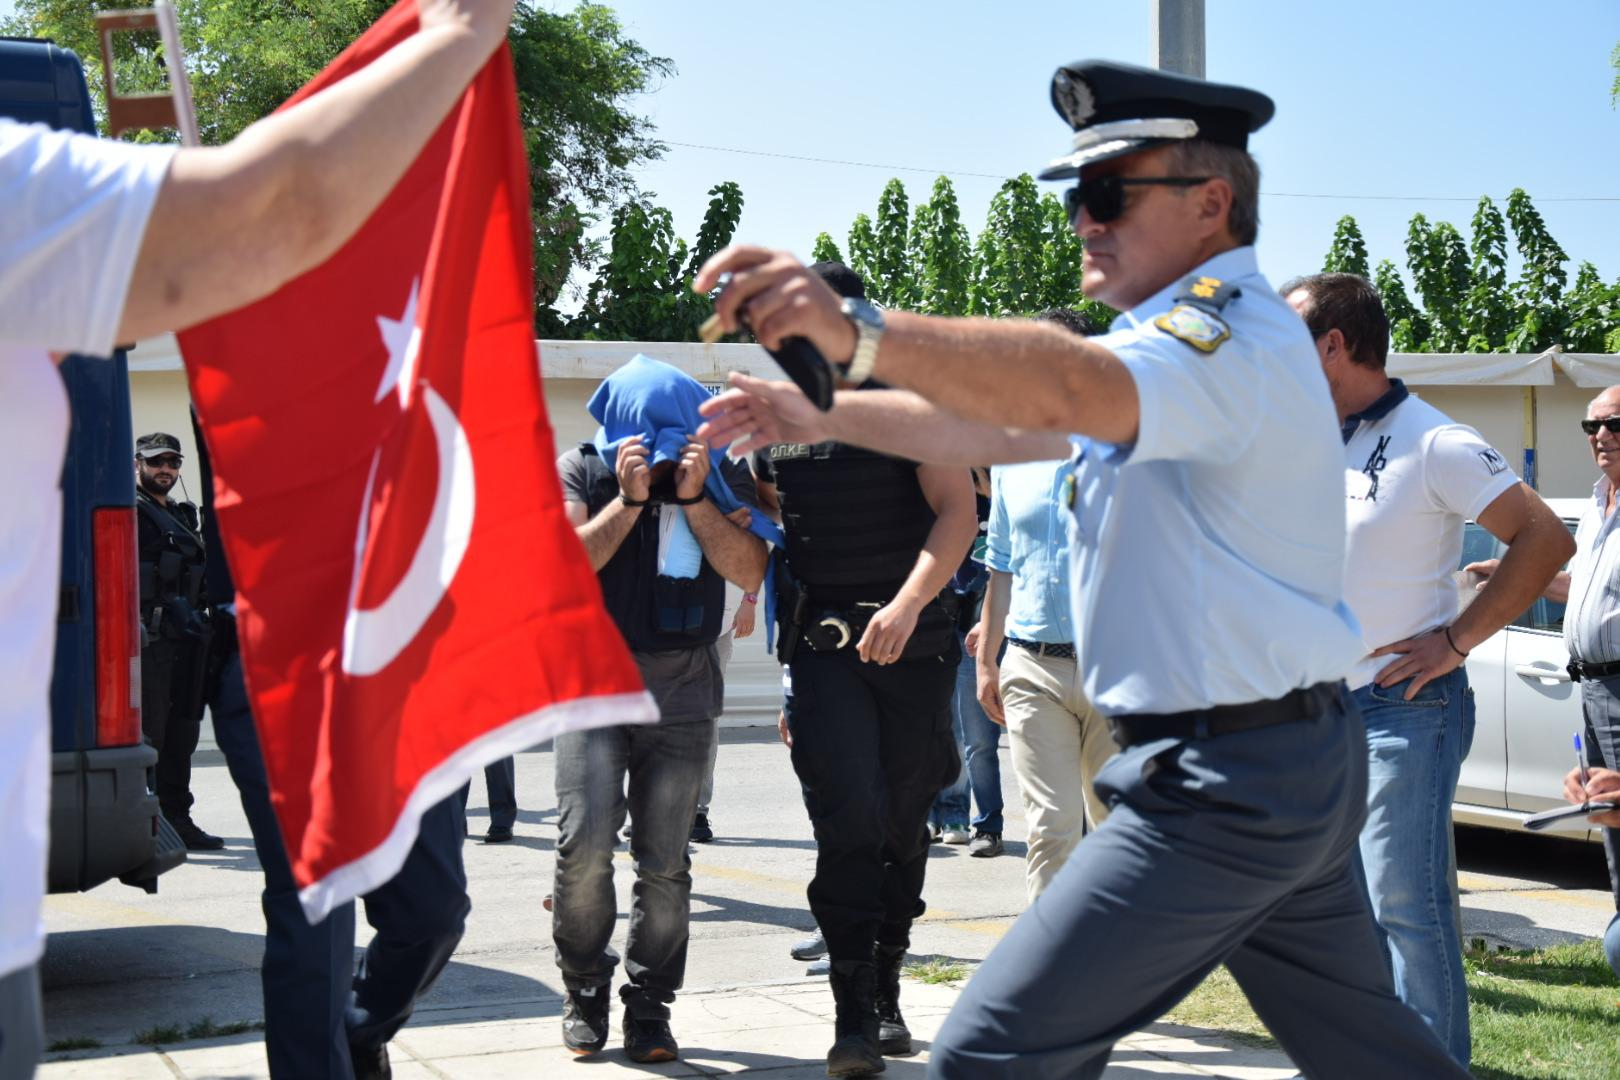 tourkoi-8-anakritis2-1000 Στο δικαστήριο οι 8 Tούρκοι στρατιώτες – Ένταση με διάσημη τρανσέξουναλ από την Τουρκία [εικόνες]